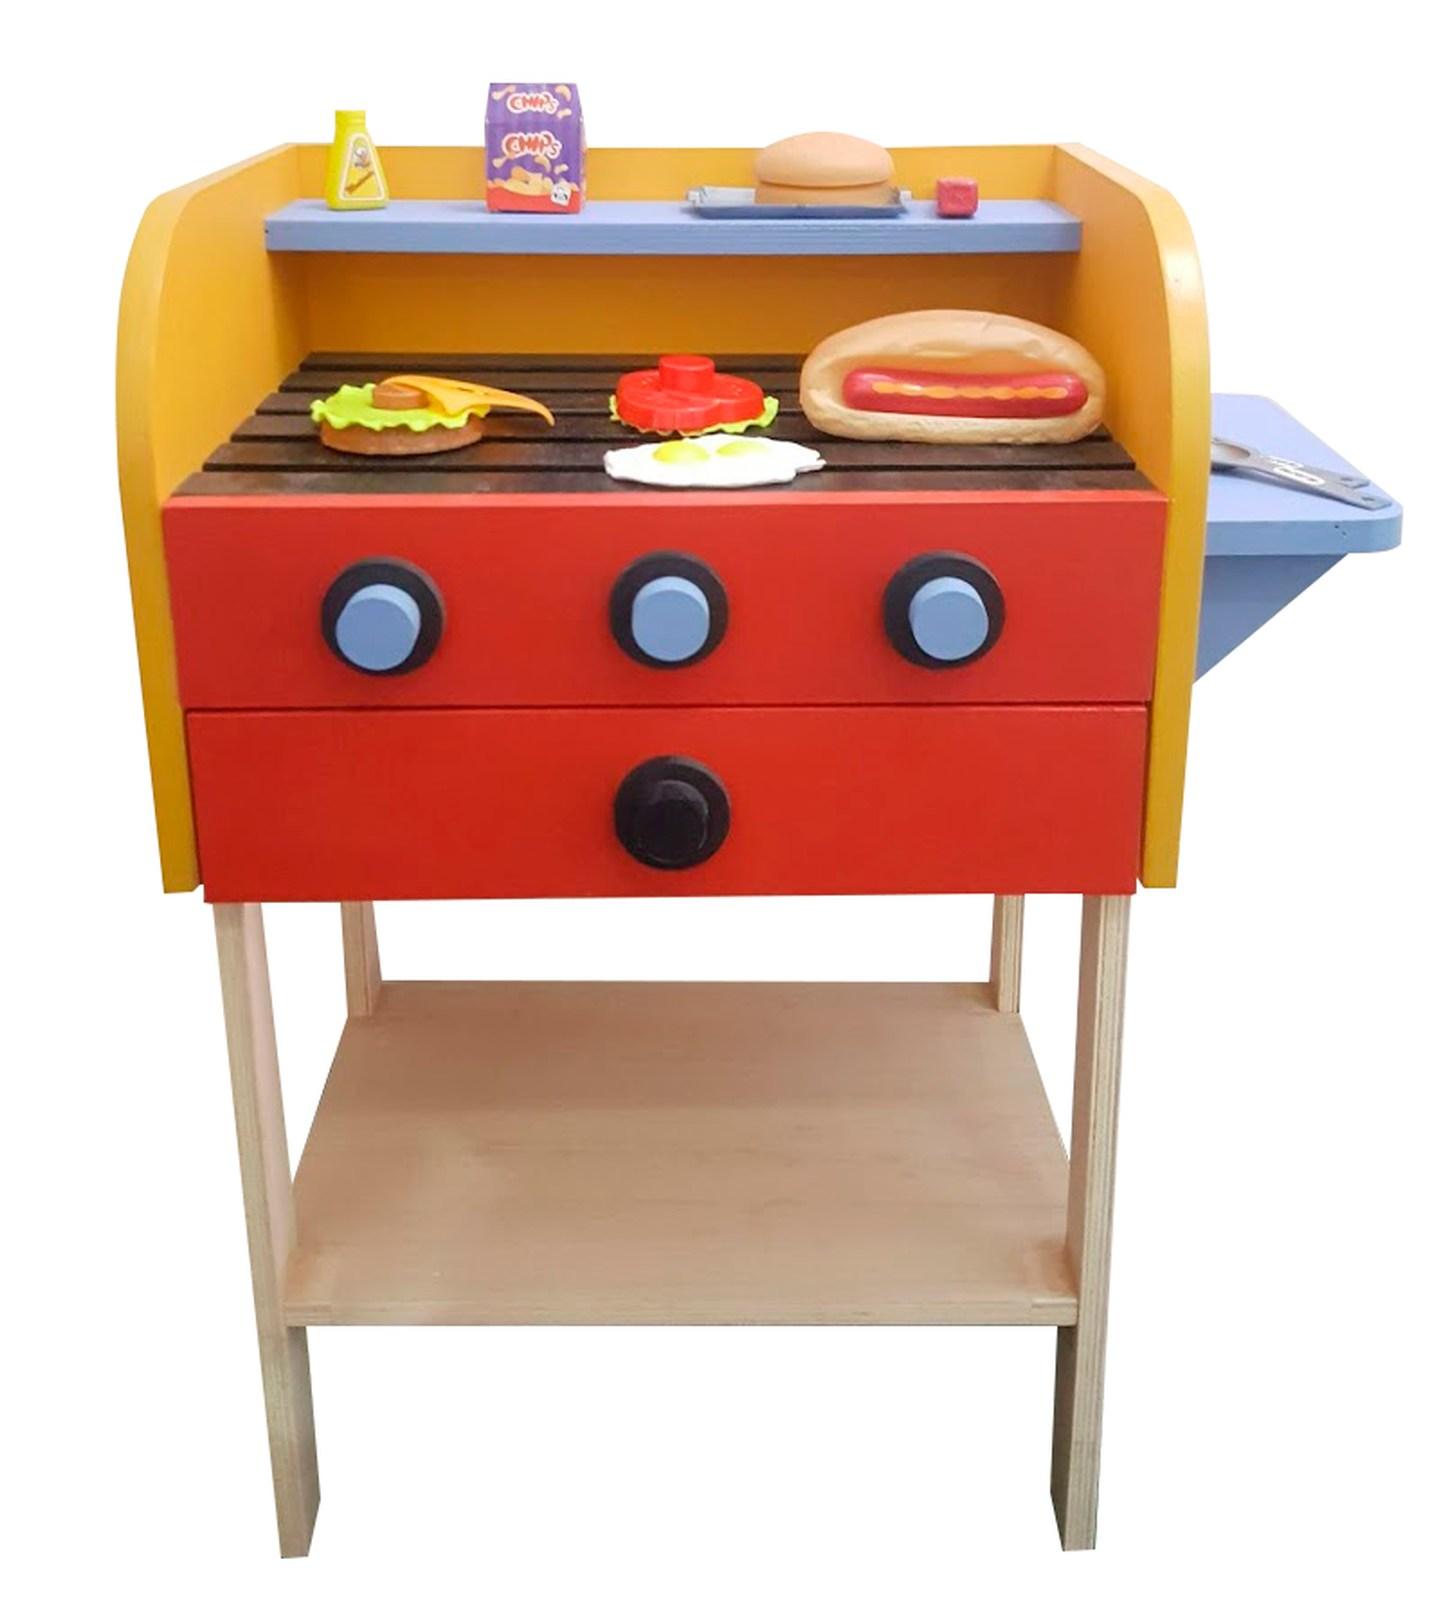 Churrasqueira Infantil de Madeira Fashion Toys